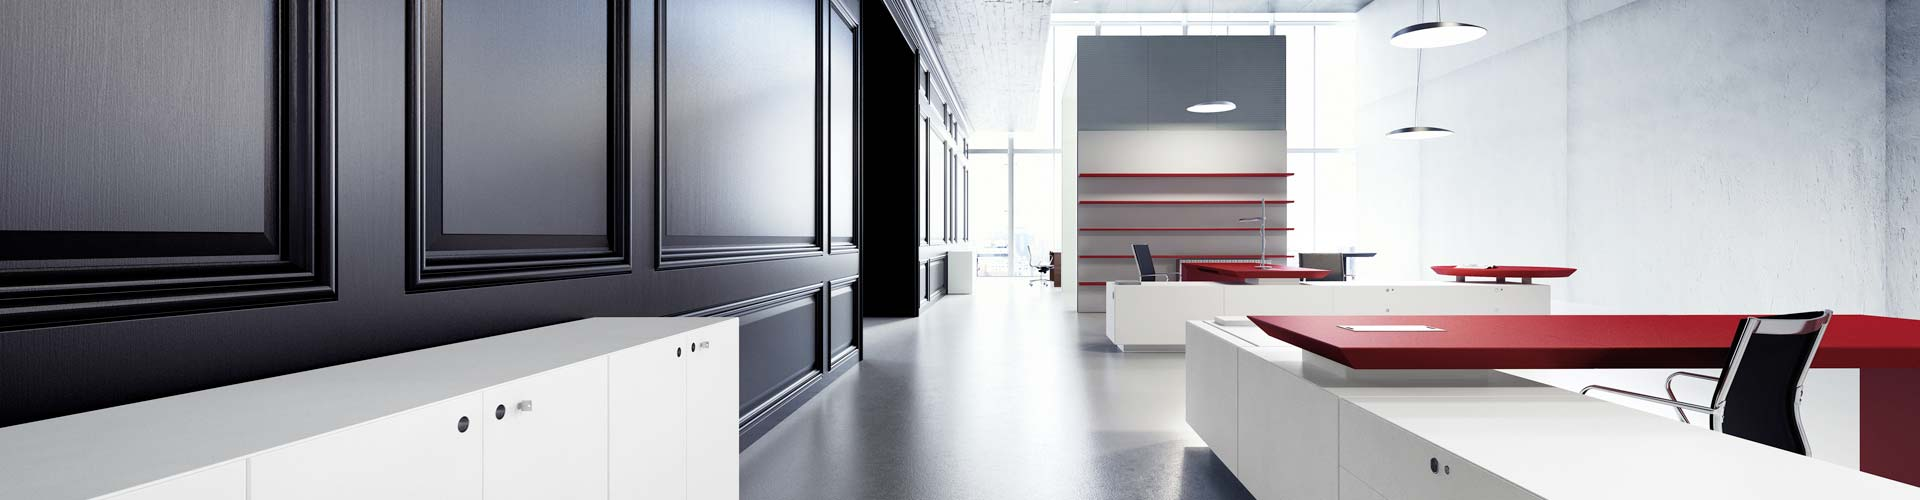 officedesk-header